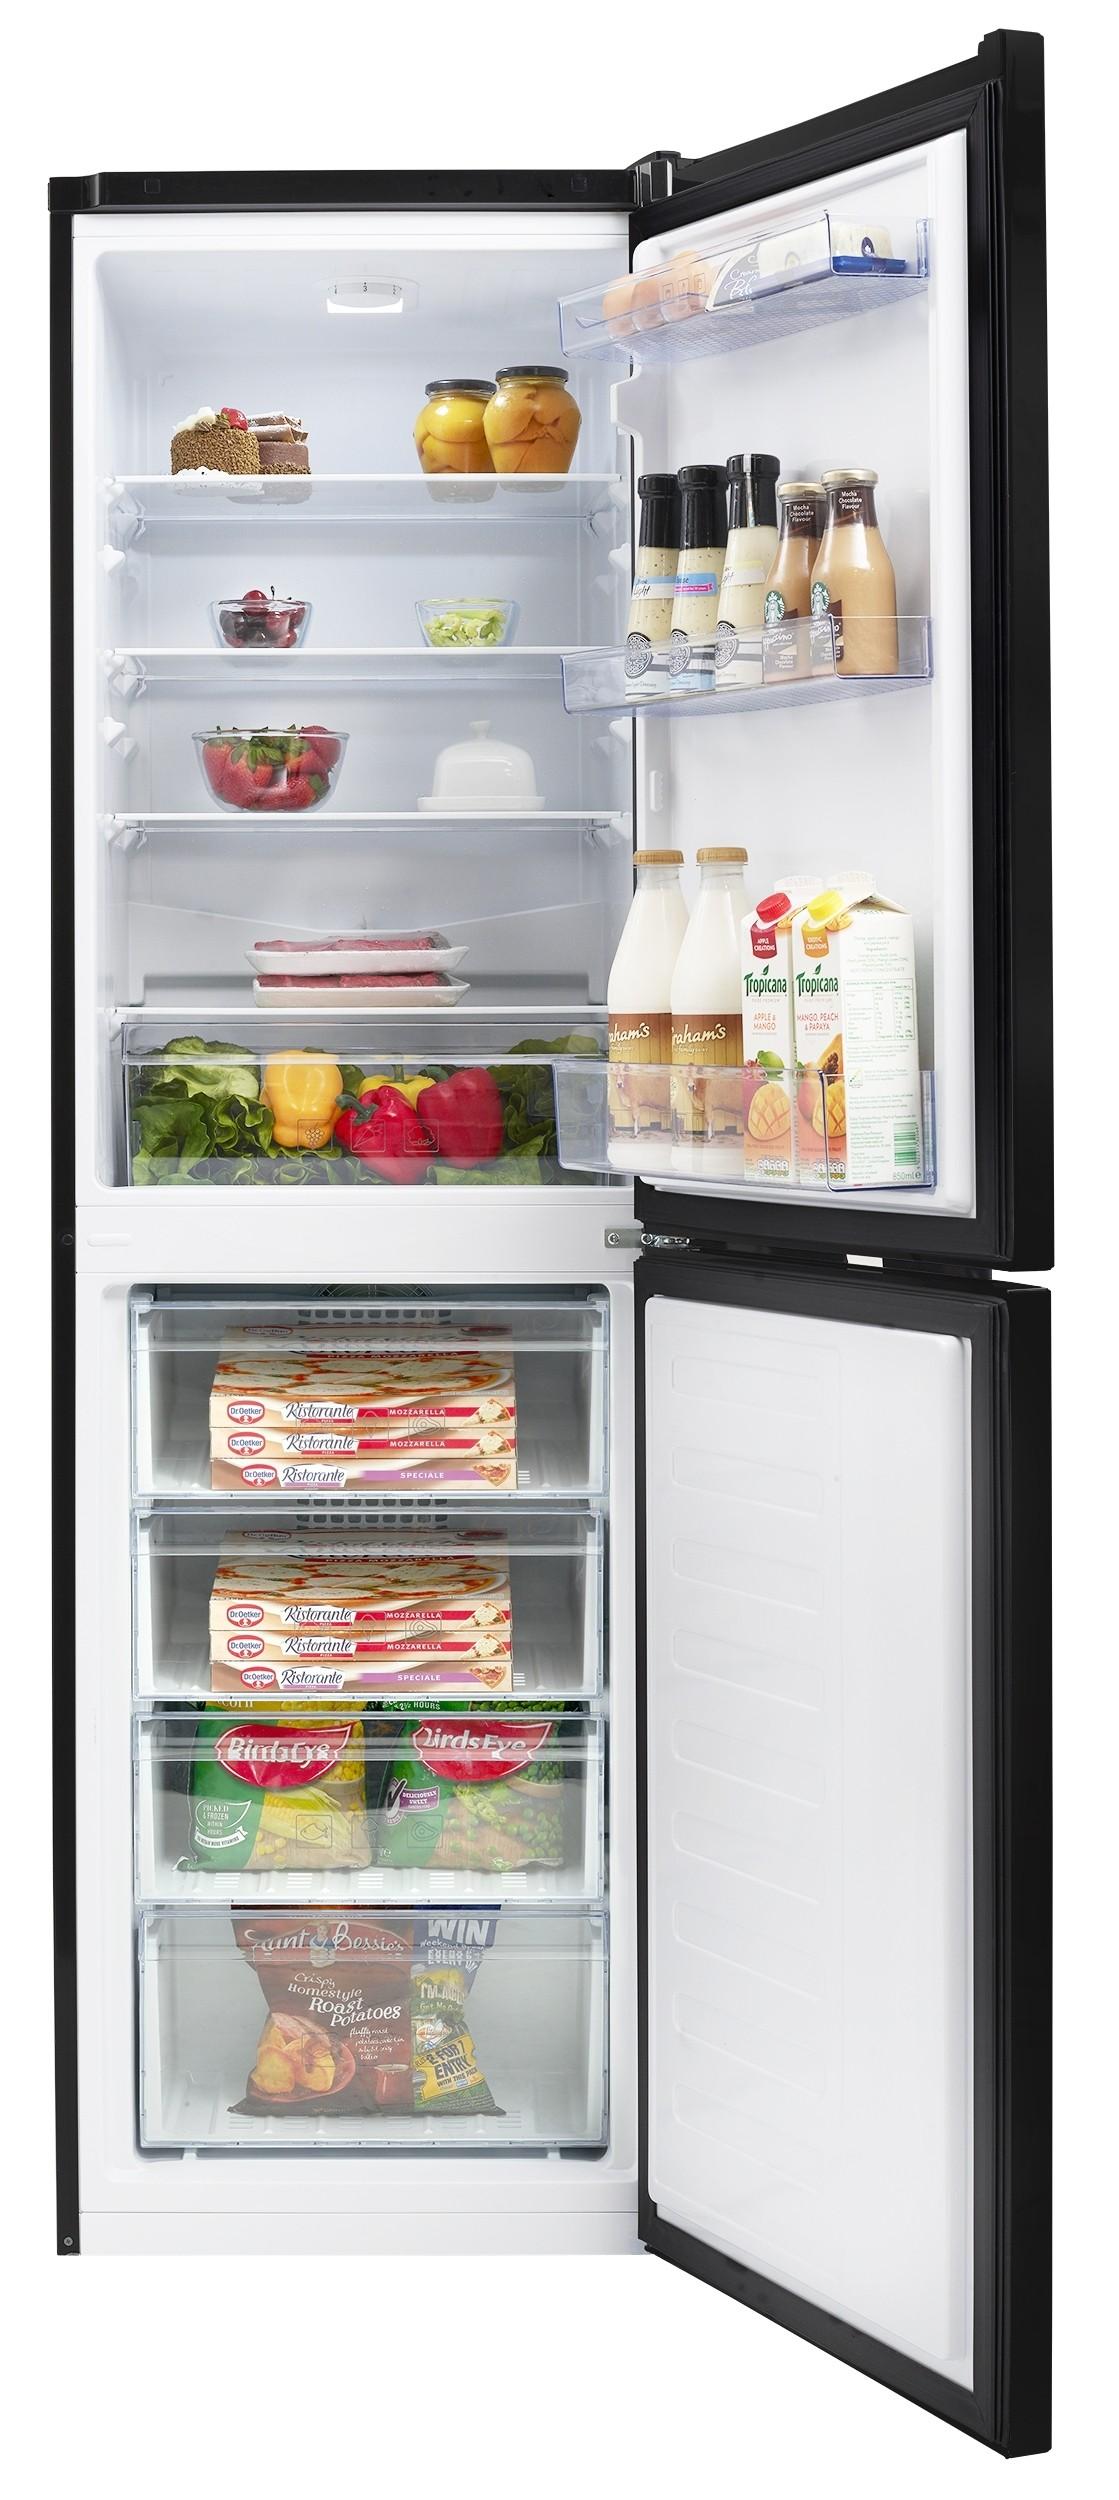 Beko CFG3582B Fridge Freezer